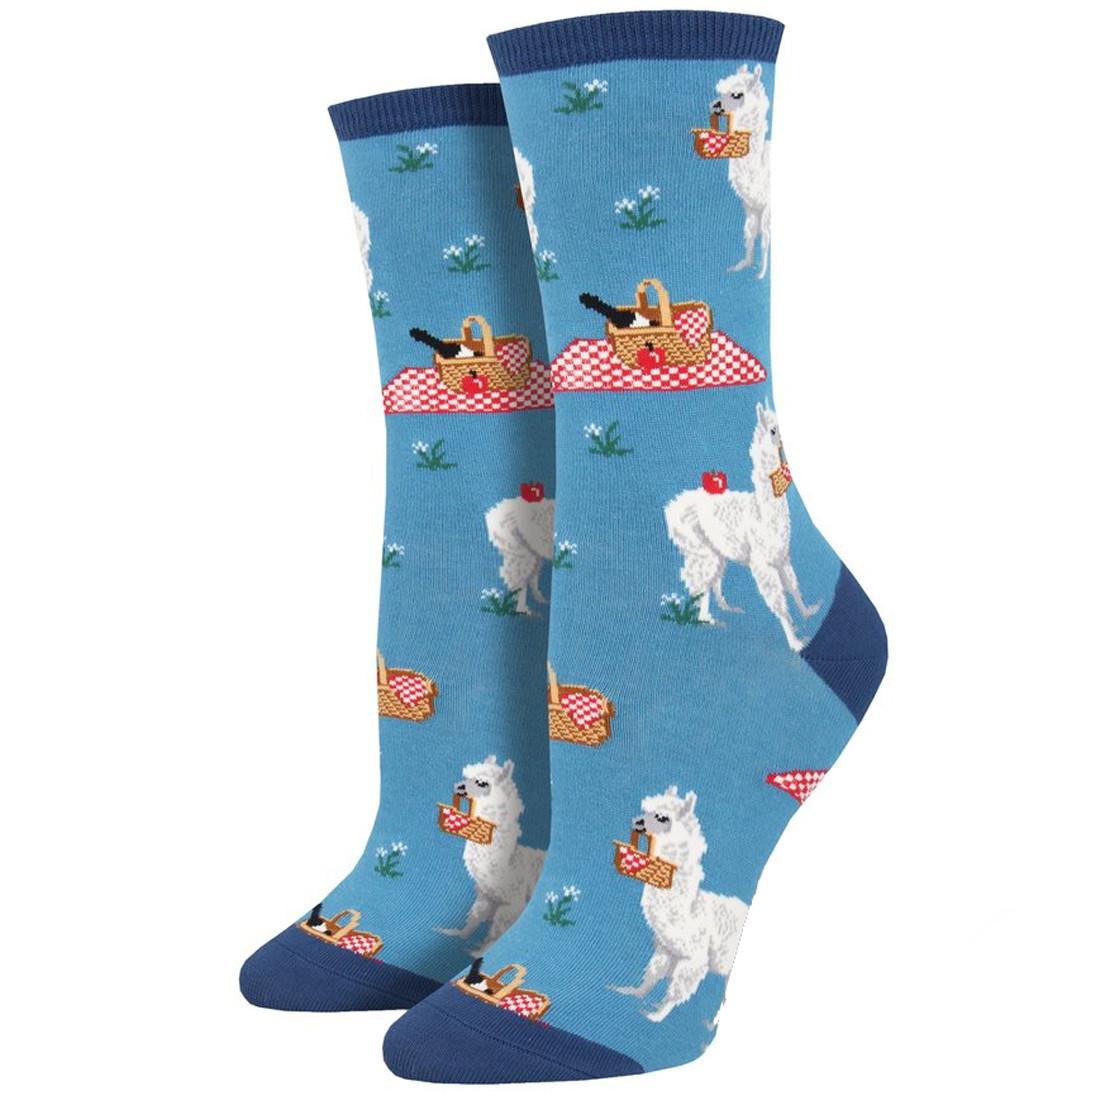 Women's Crew Socks Llama Alpaca Picnic Lunch Blue